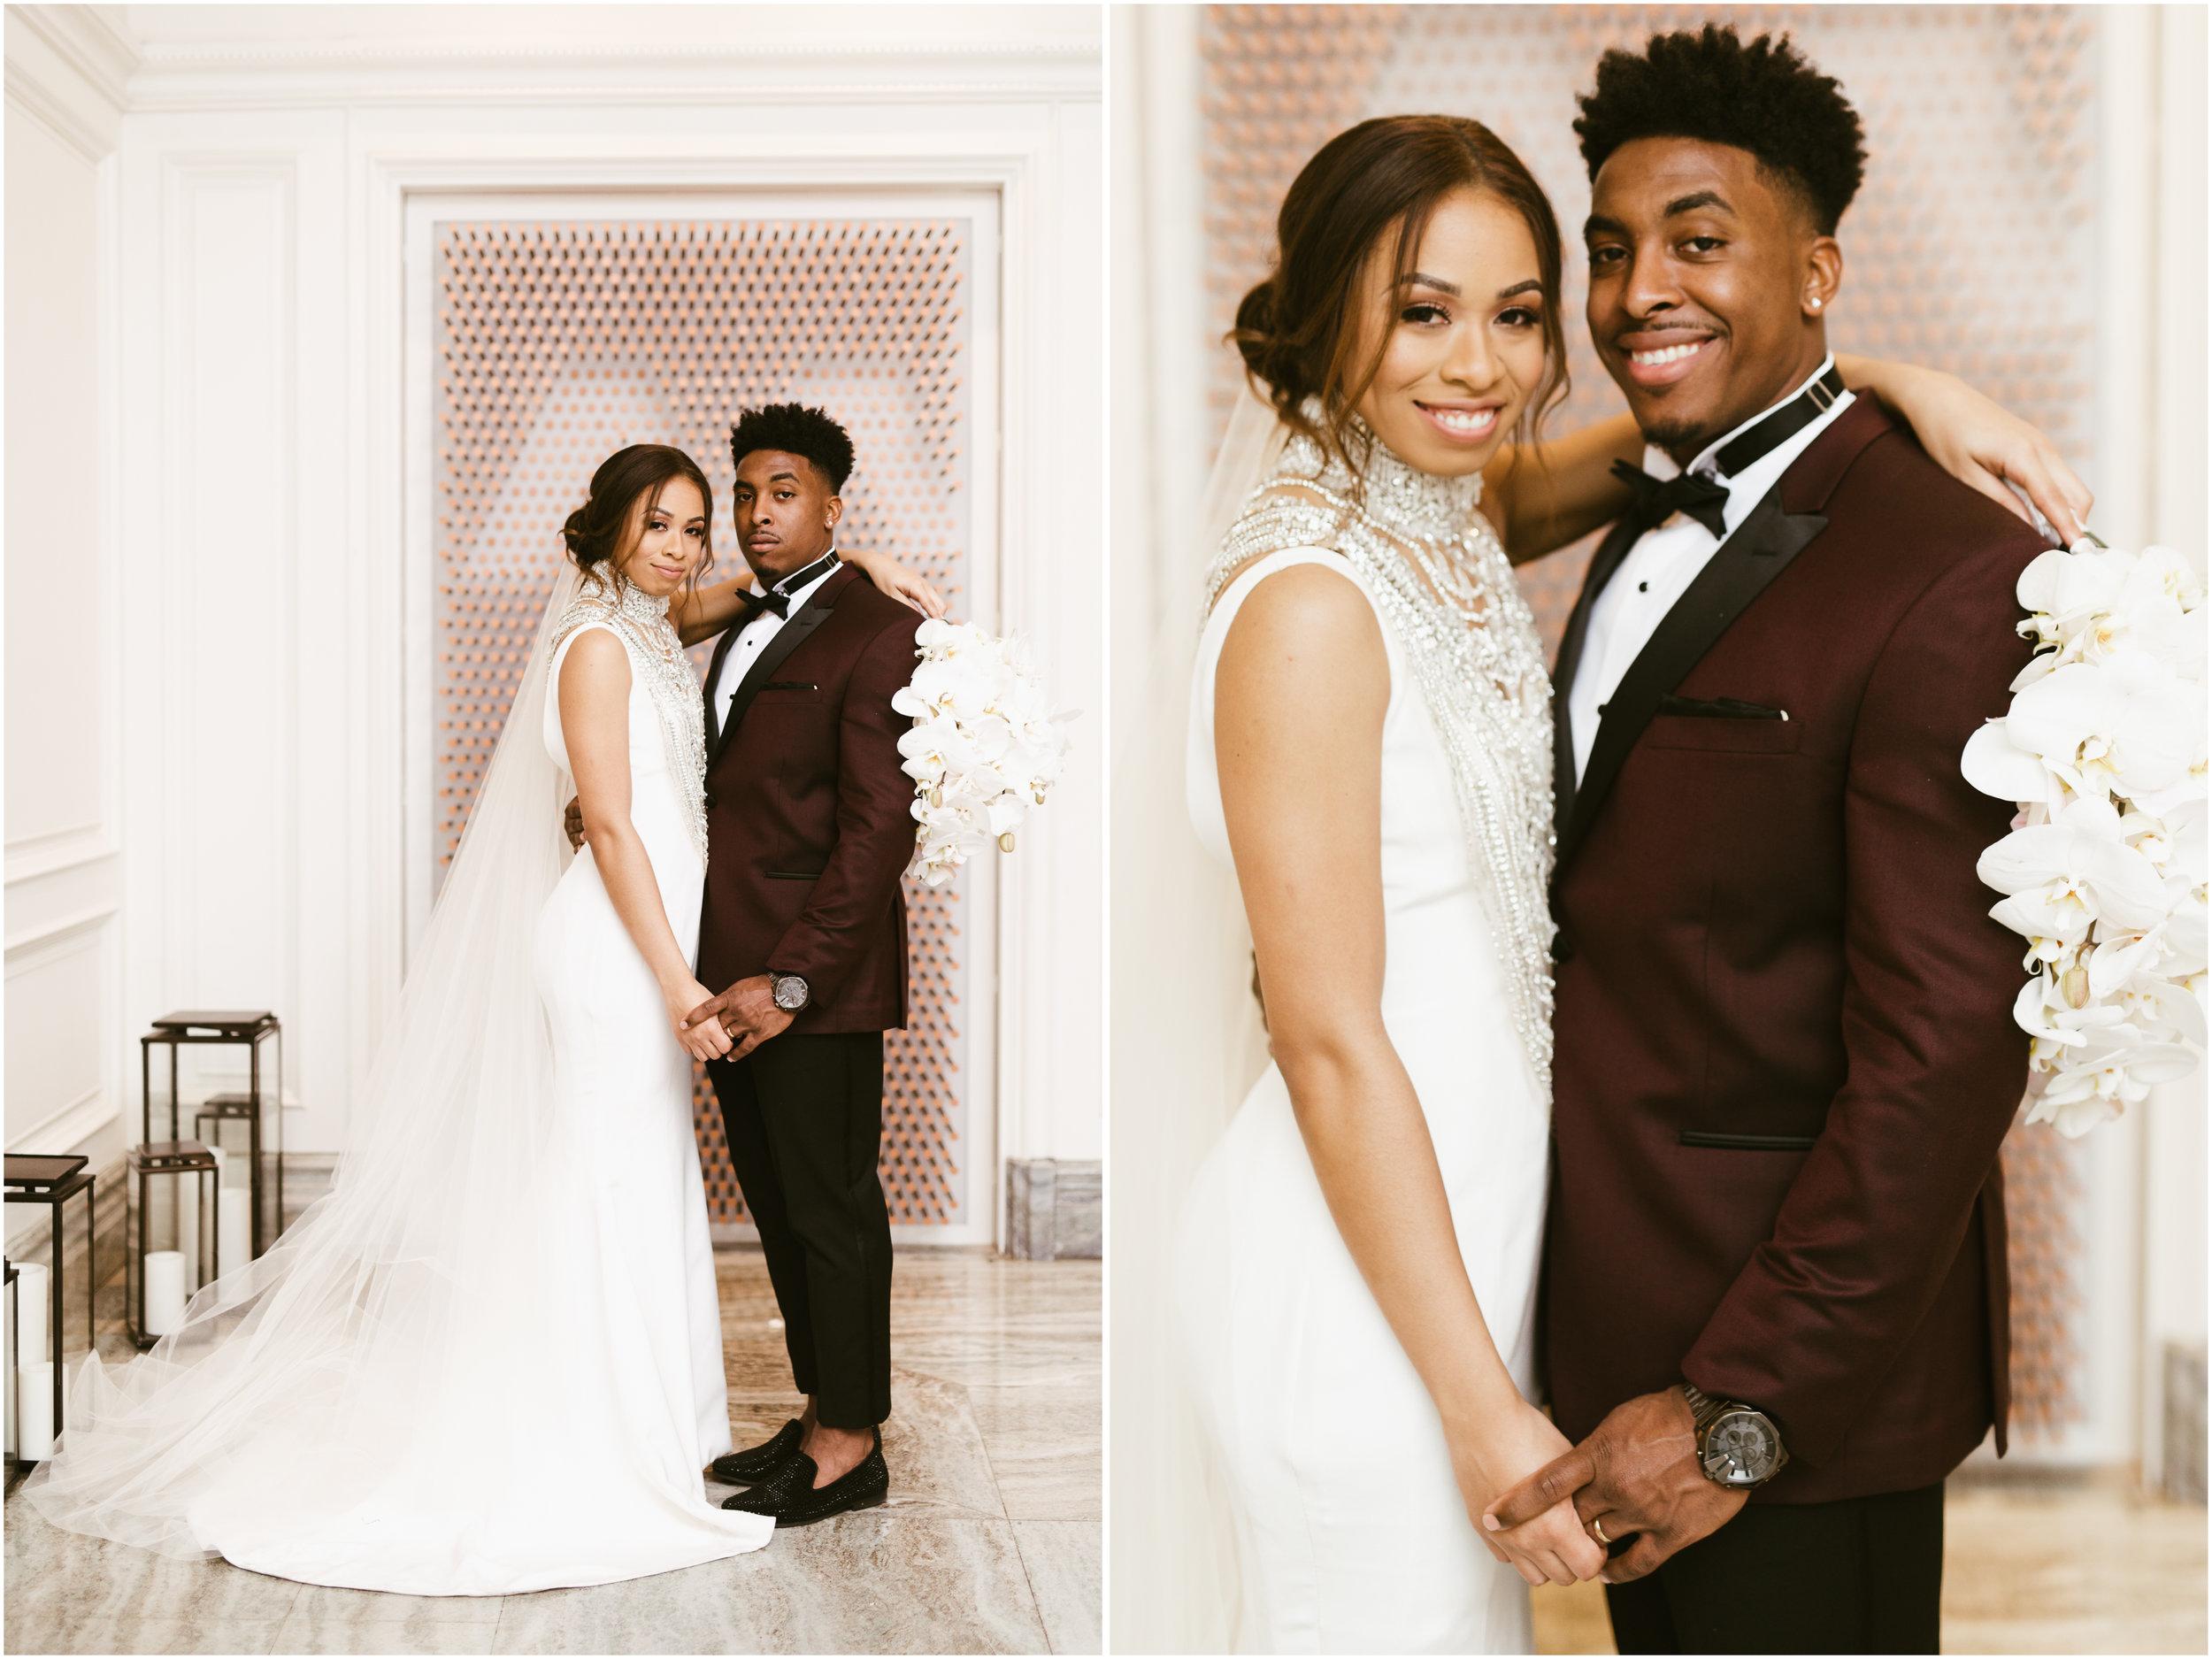 The_camby_wedding.jpg